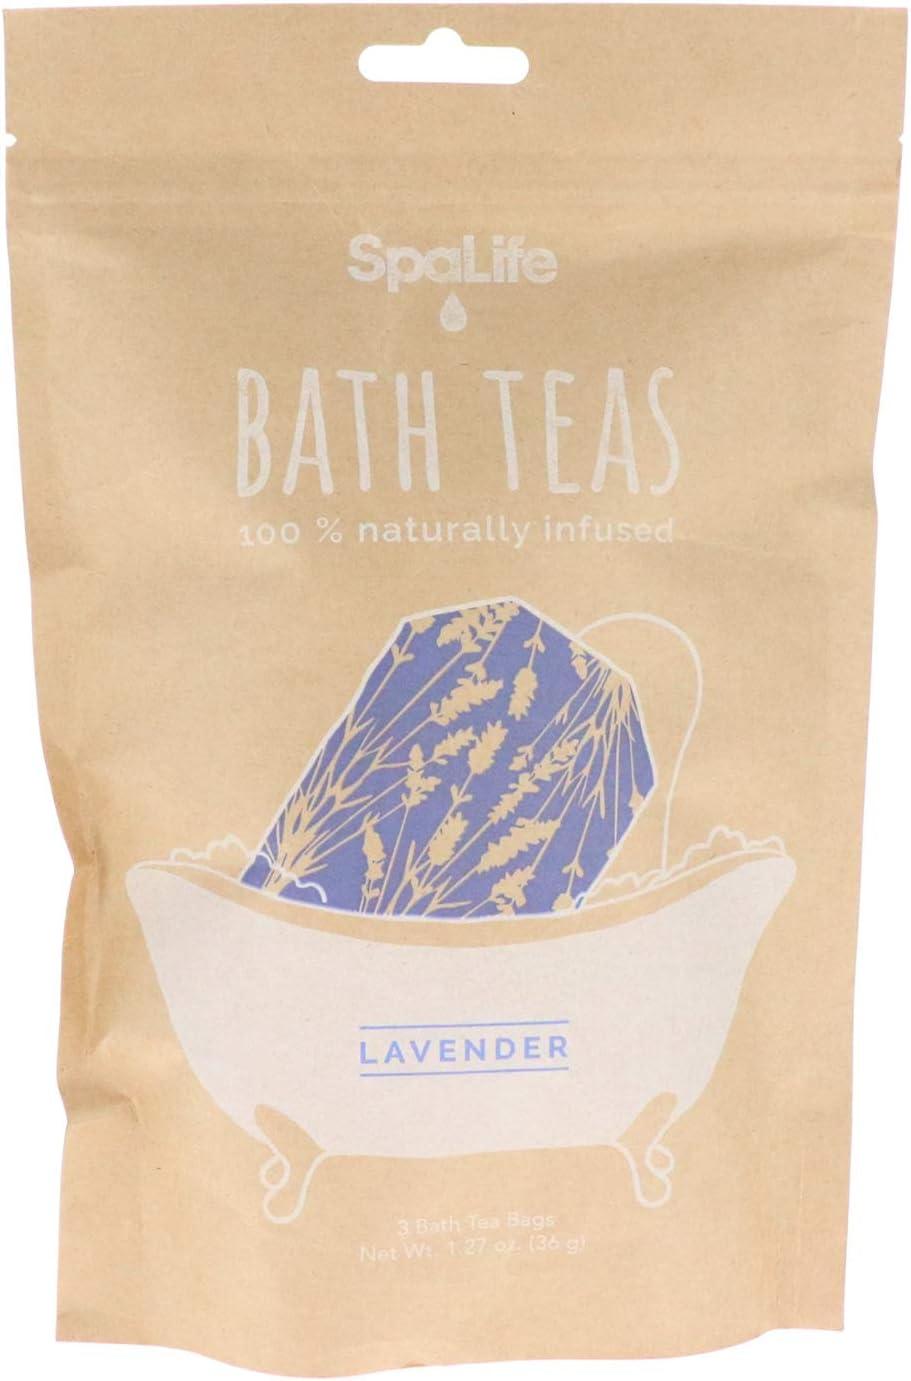 SpaLife Naturally Infused Bath Tea (3 Pack) (Lavender)